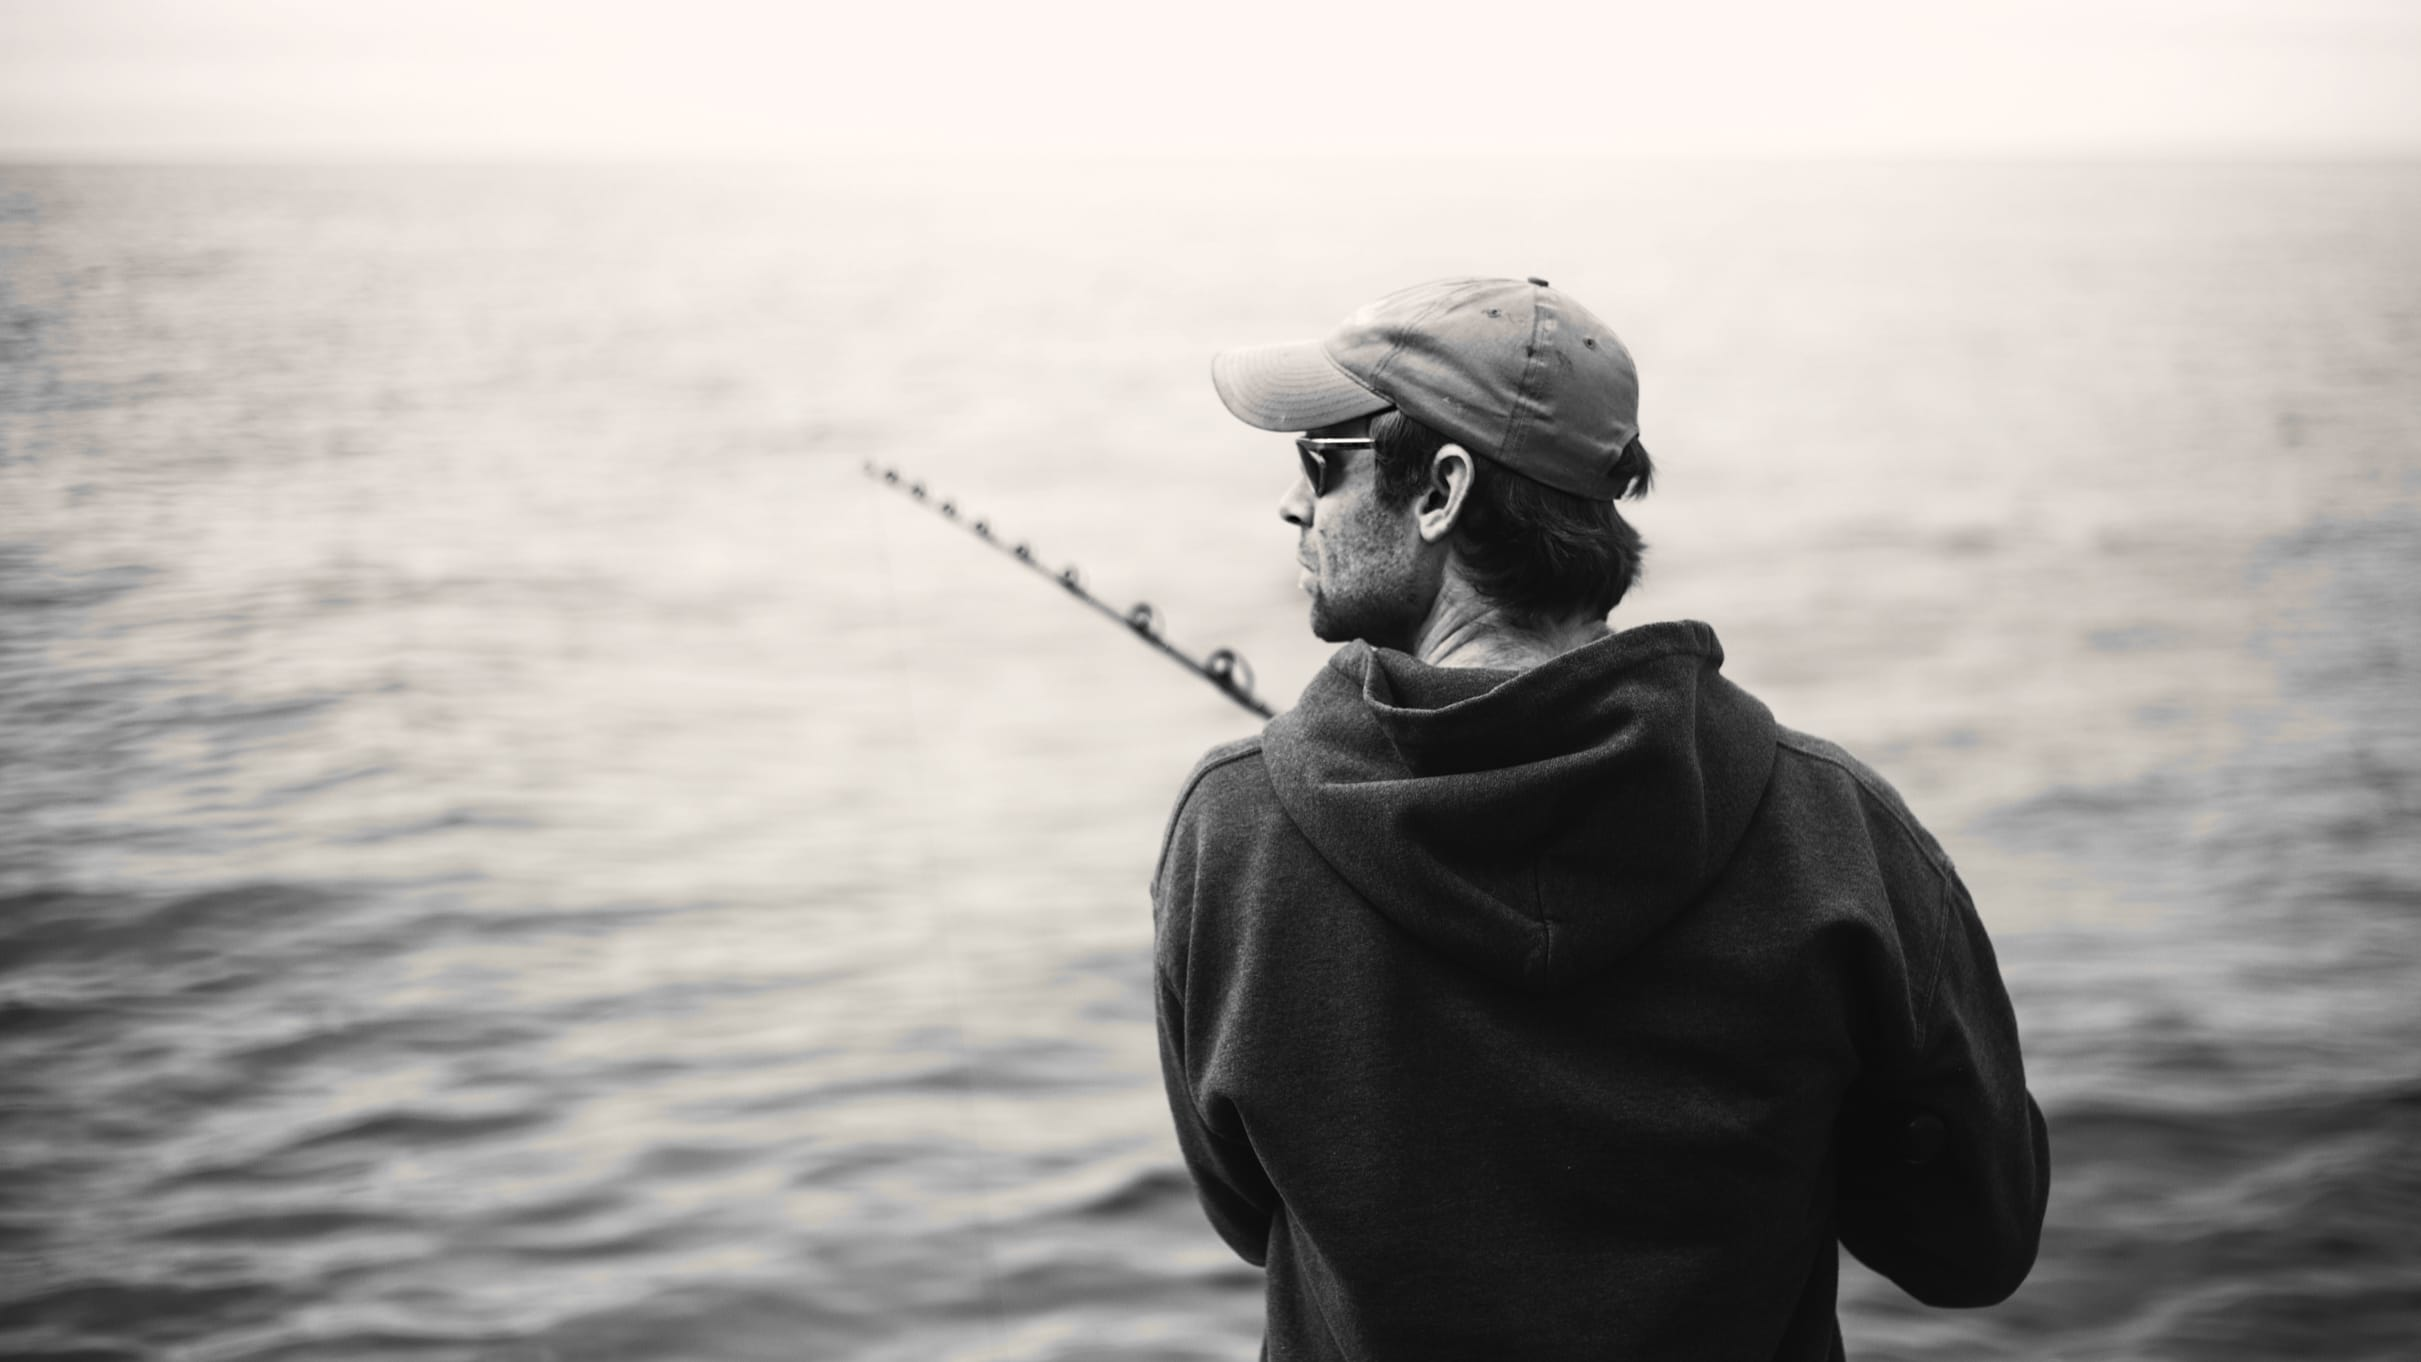 David Bayes owner of DeepStrike Sportfishing in Homer, Alaska